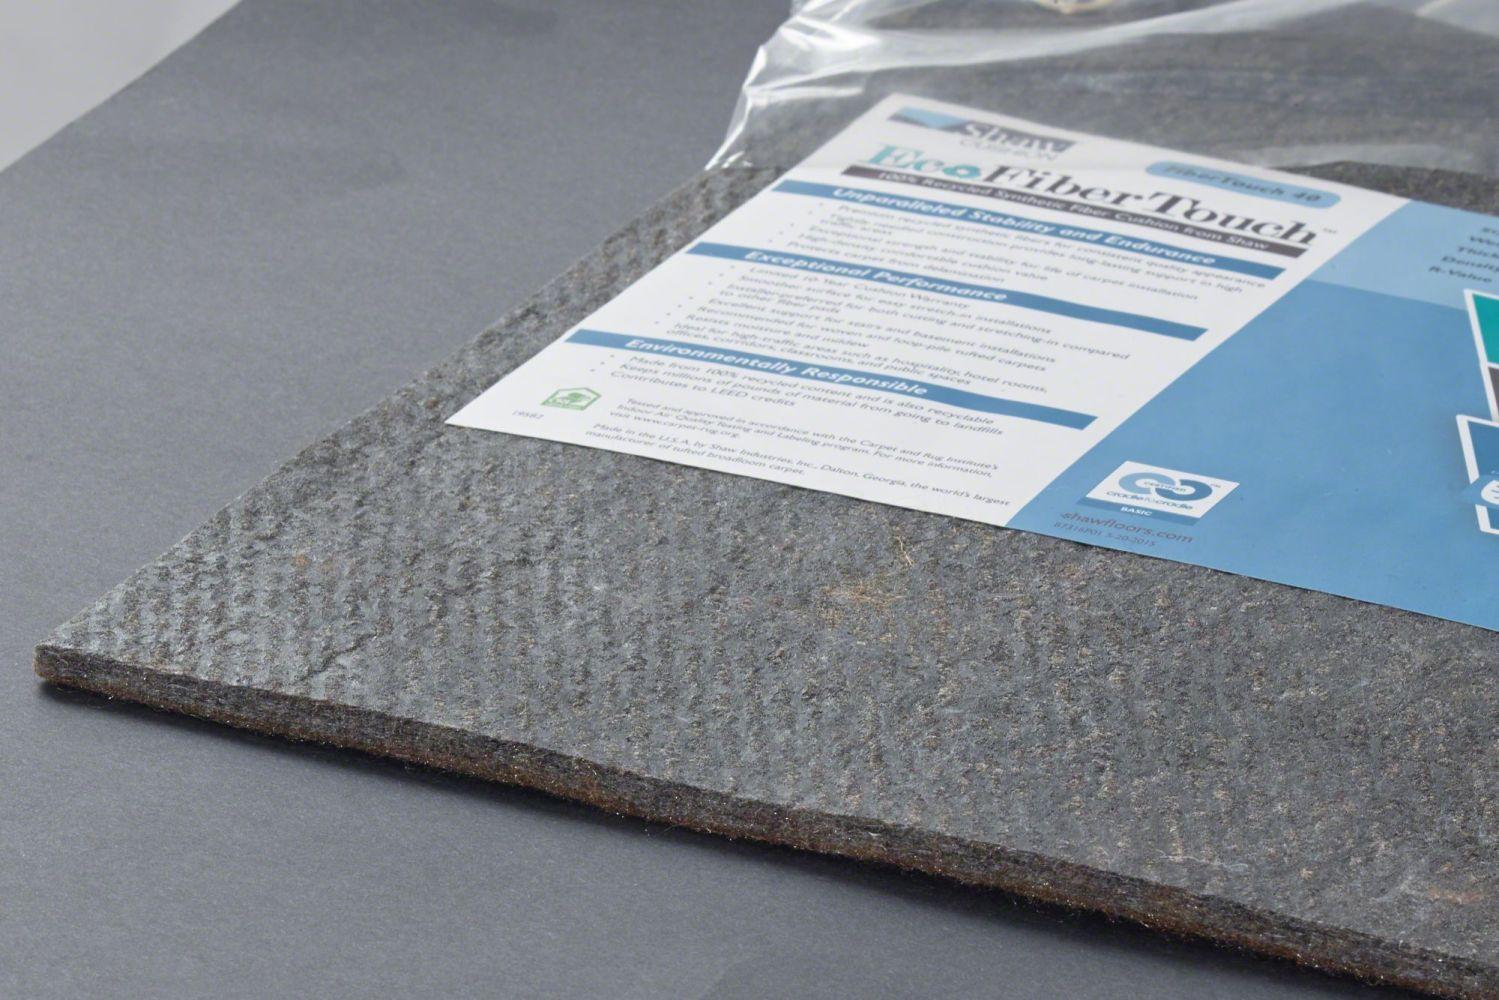 Shaw Floors Eco Edge Cushion Fibertouch 40-6 Grey 00001_404FT